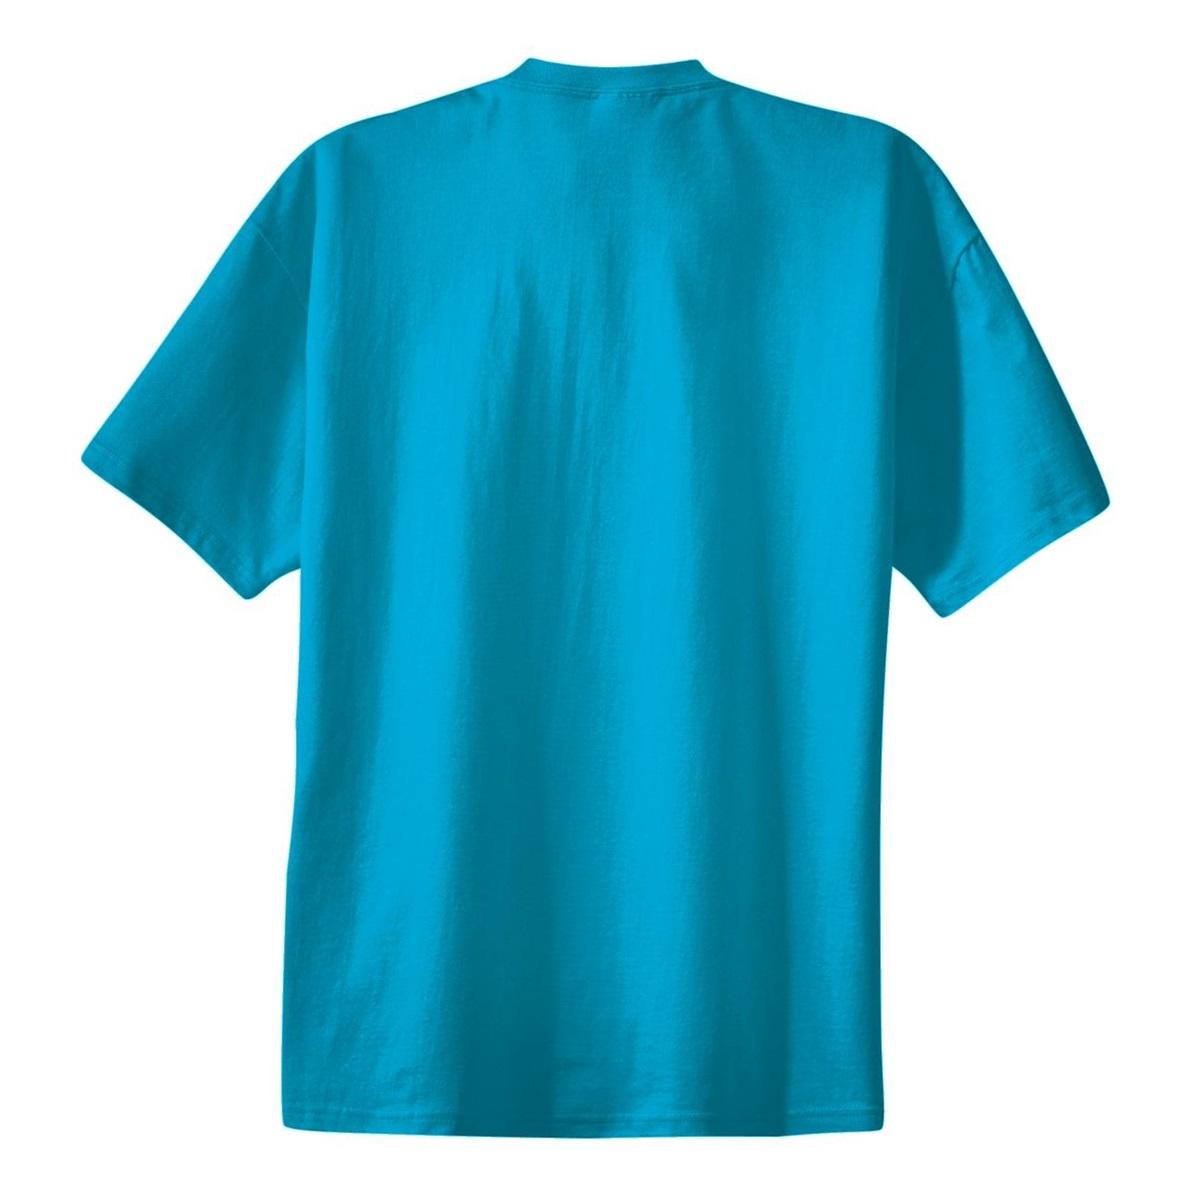 Port company pc61 essential t shirt turquoise for Aqua blue color t shirt